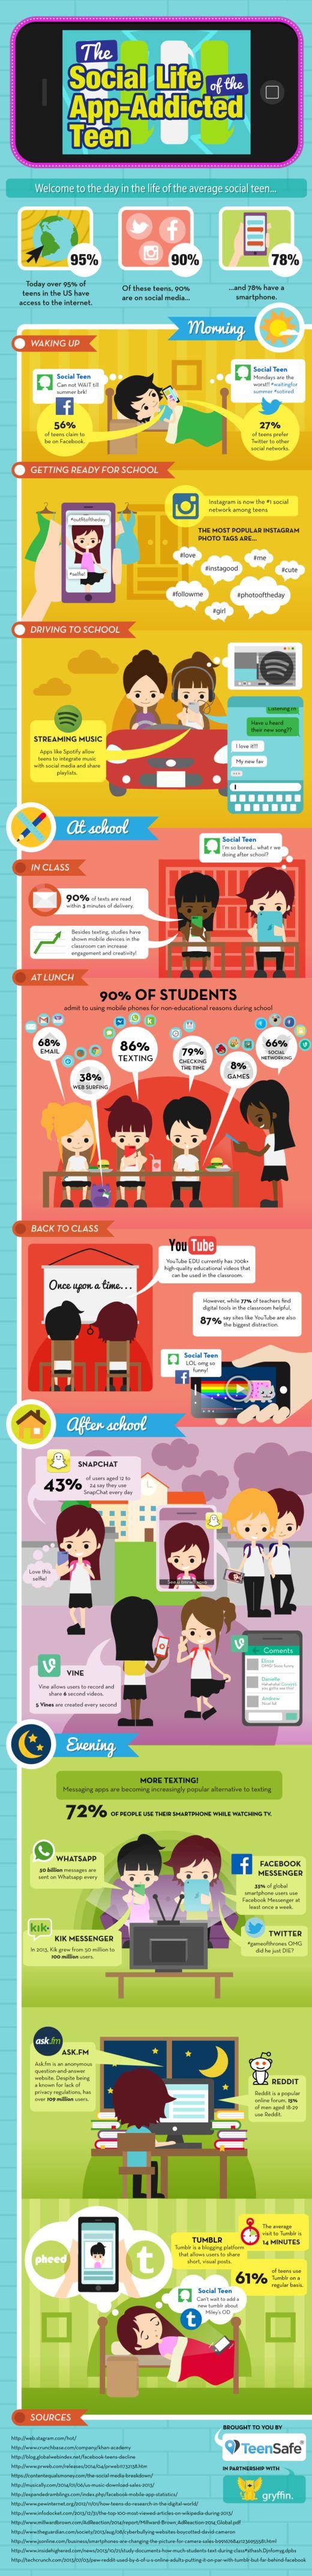 Teen Social Media Infographic